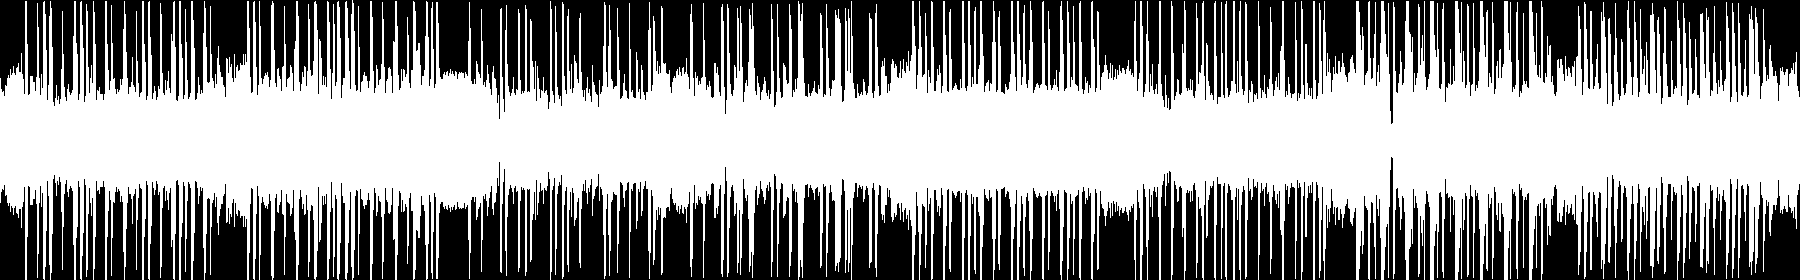 Torii - Lofi Beats audio waveform